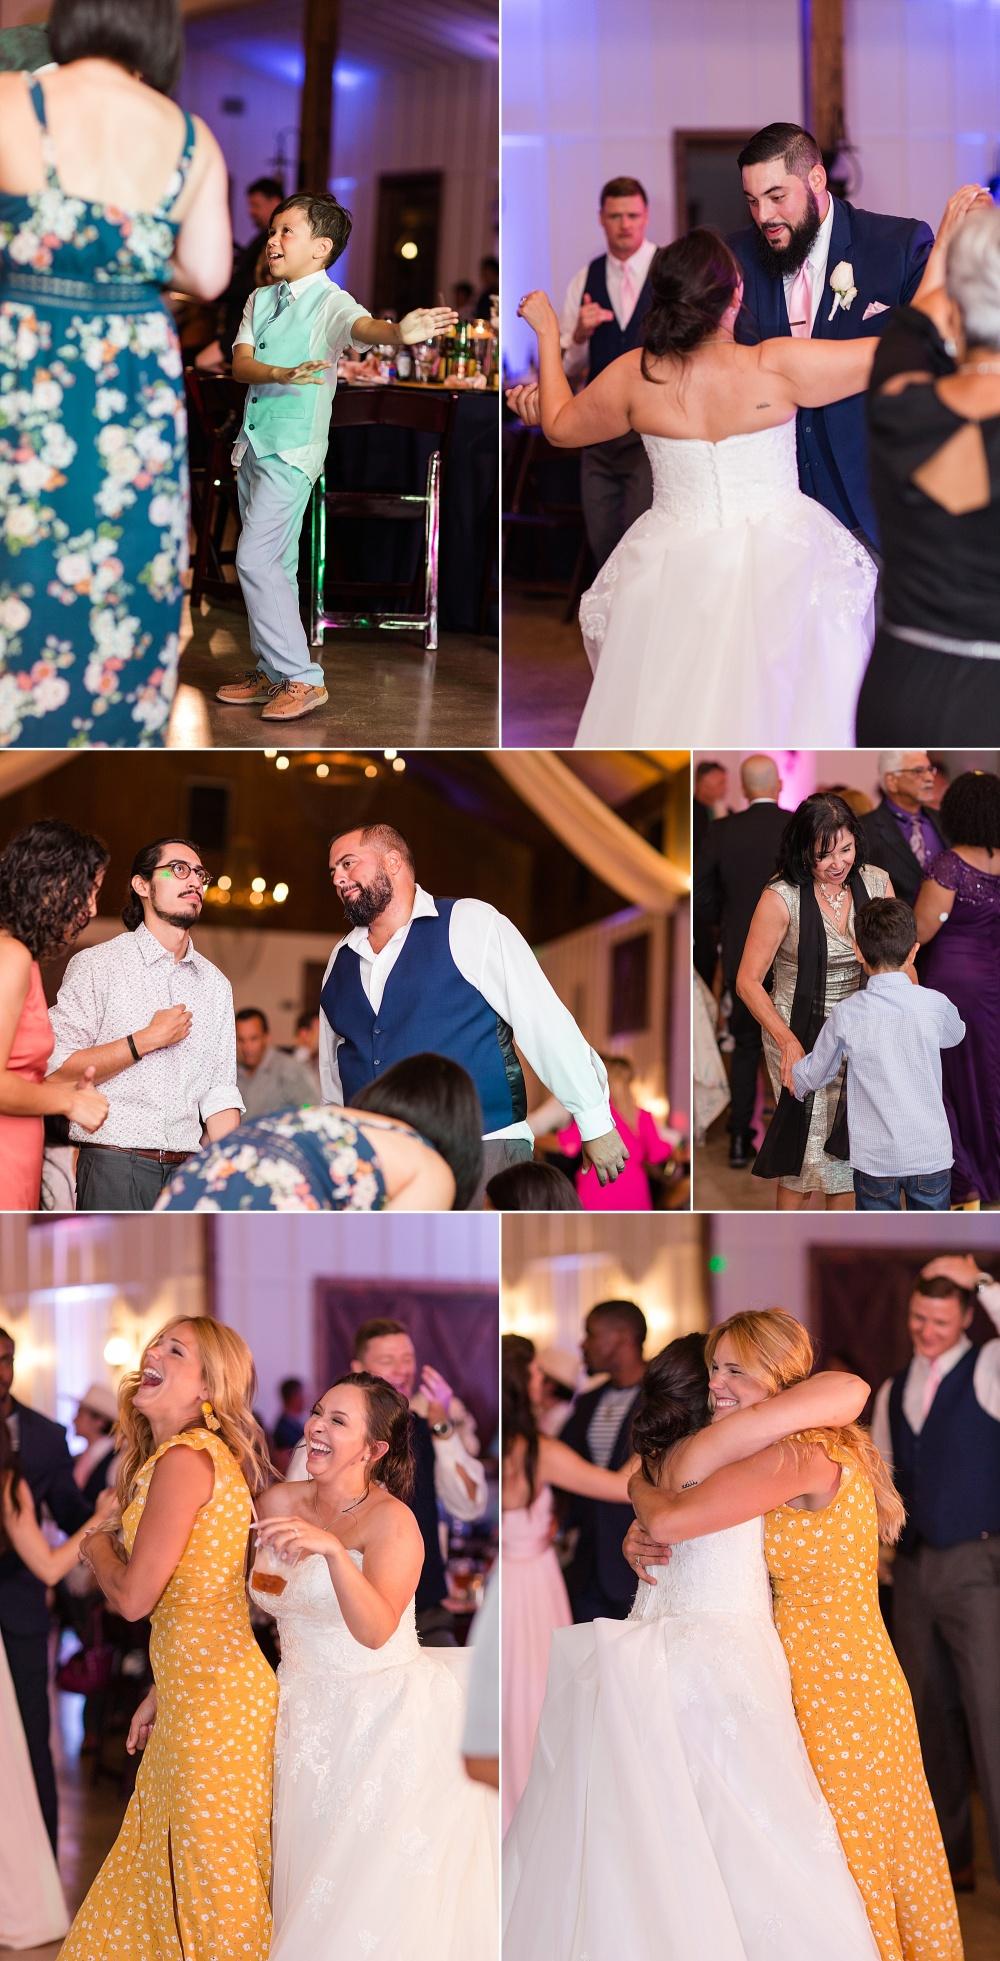 Wedding-Photographer-Bulverde-Texas-Western-Sky-Event-Venue-Carly-Barton-Photography_0084.jpg